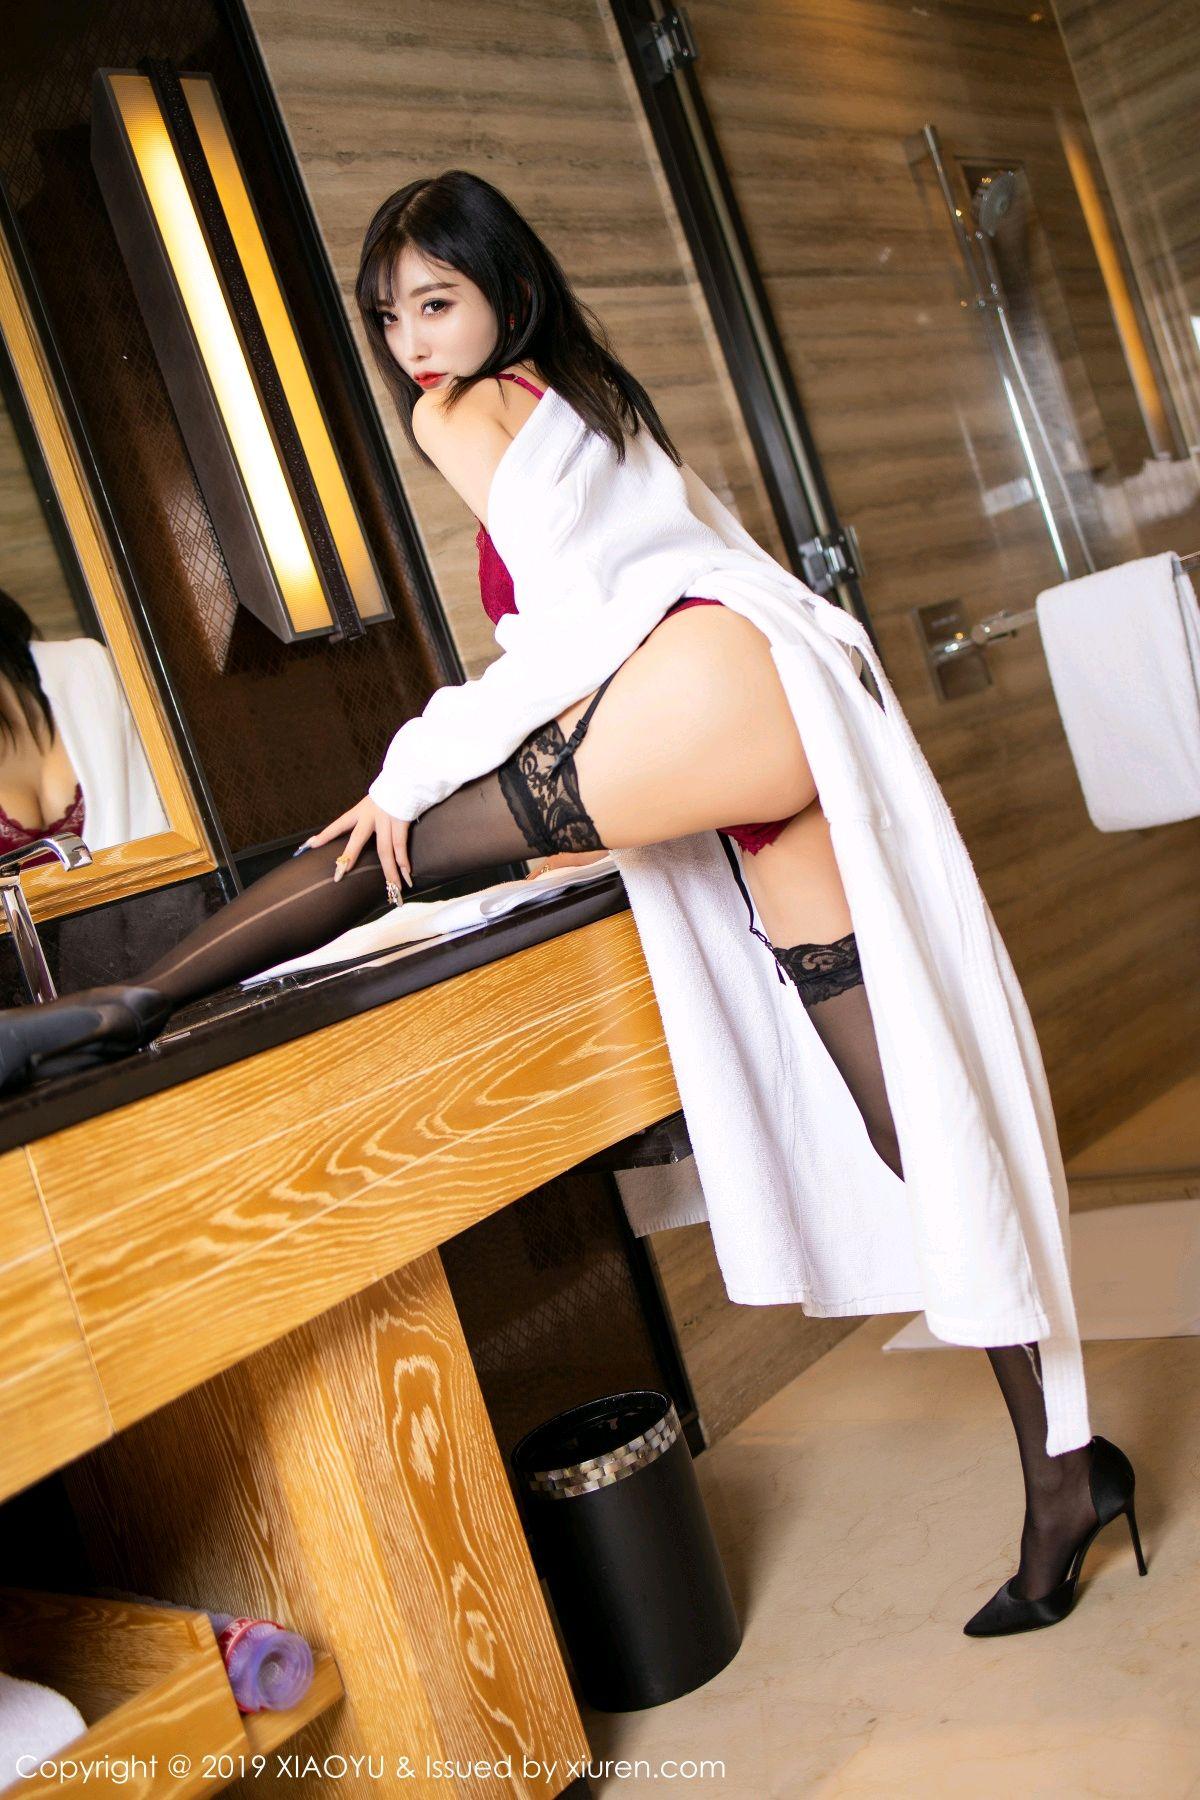 [XiaoYu] Vol.153 Yang Chen Chen 21P, Bathroom, Black Silk, Underwear, XiaoYu, Yang Chen Chen